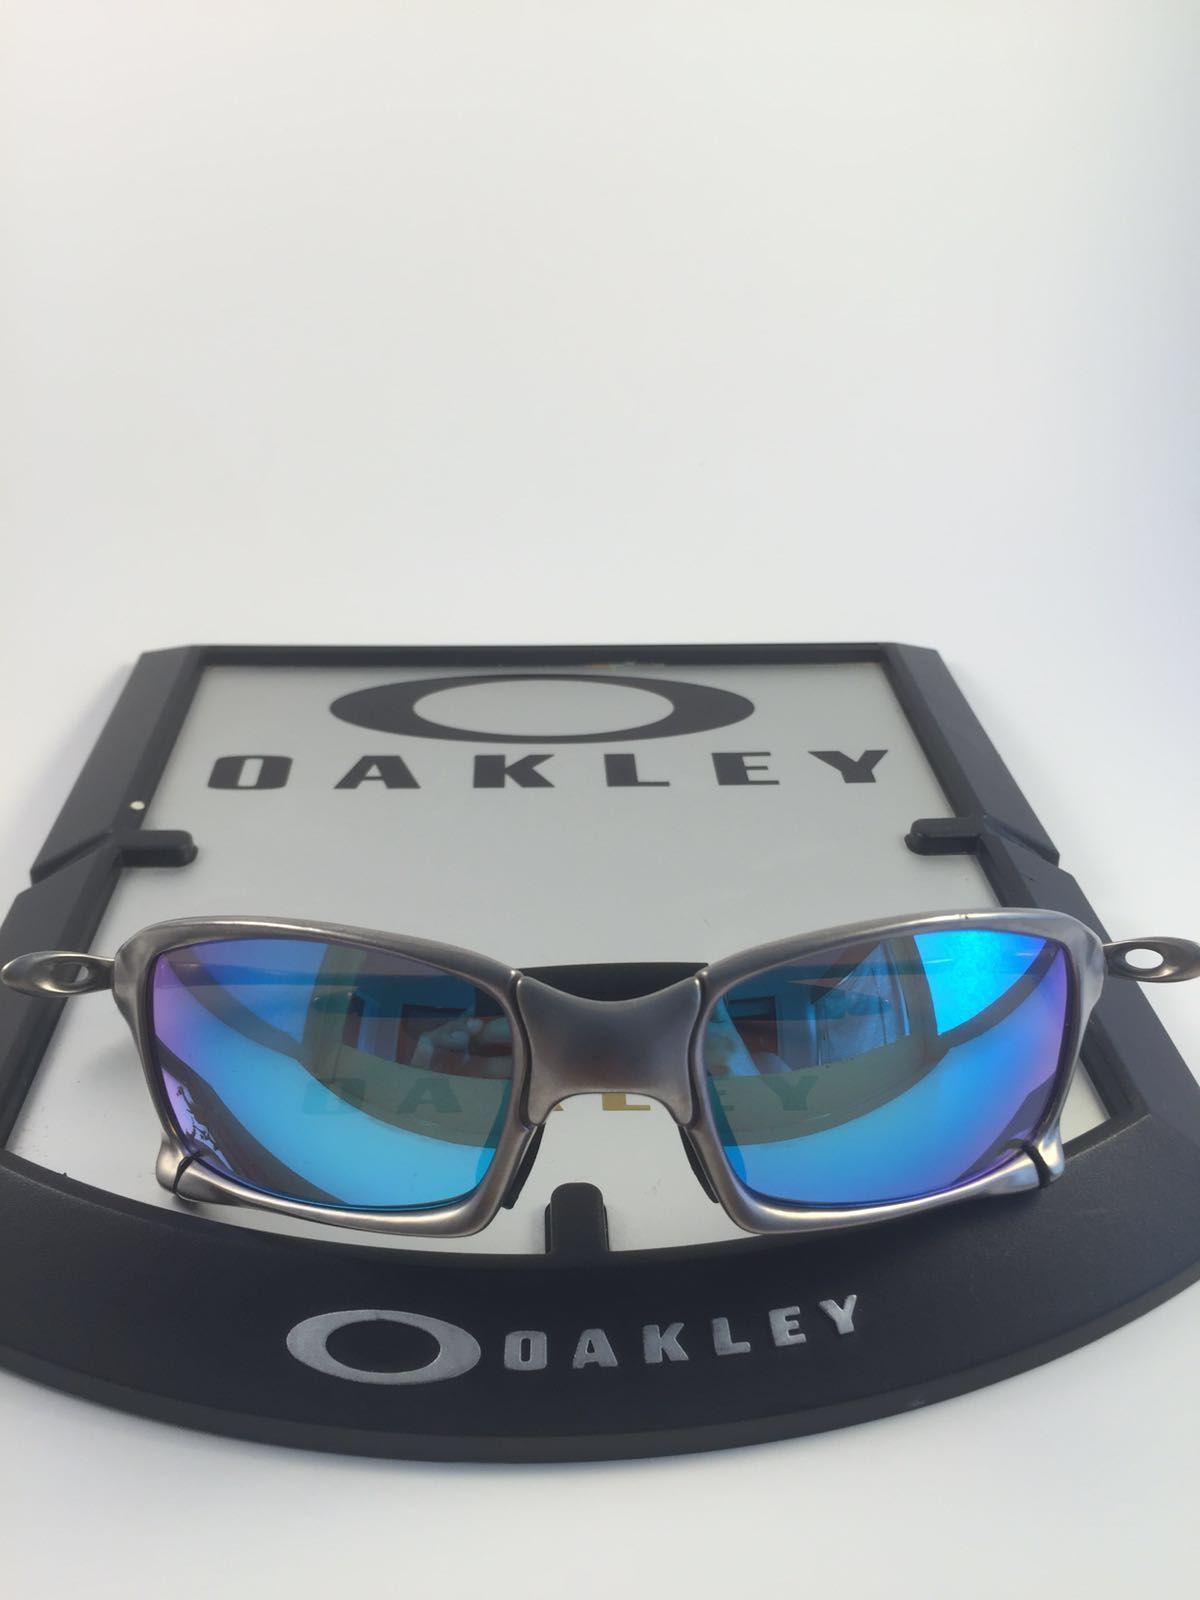 oakley x squared plasma - c88633b1-f189-4af6-a07e-25bdeb62c13a.jpeg